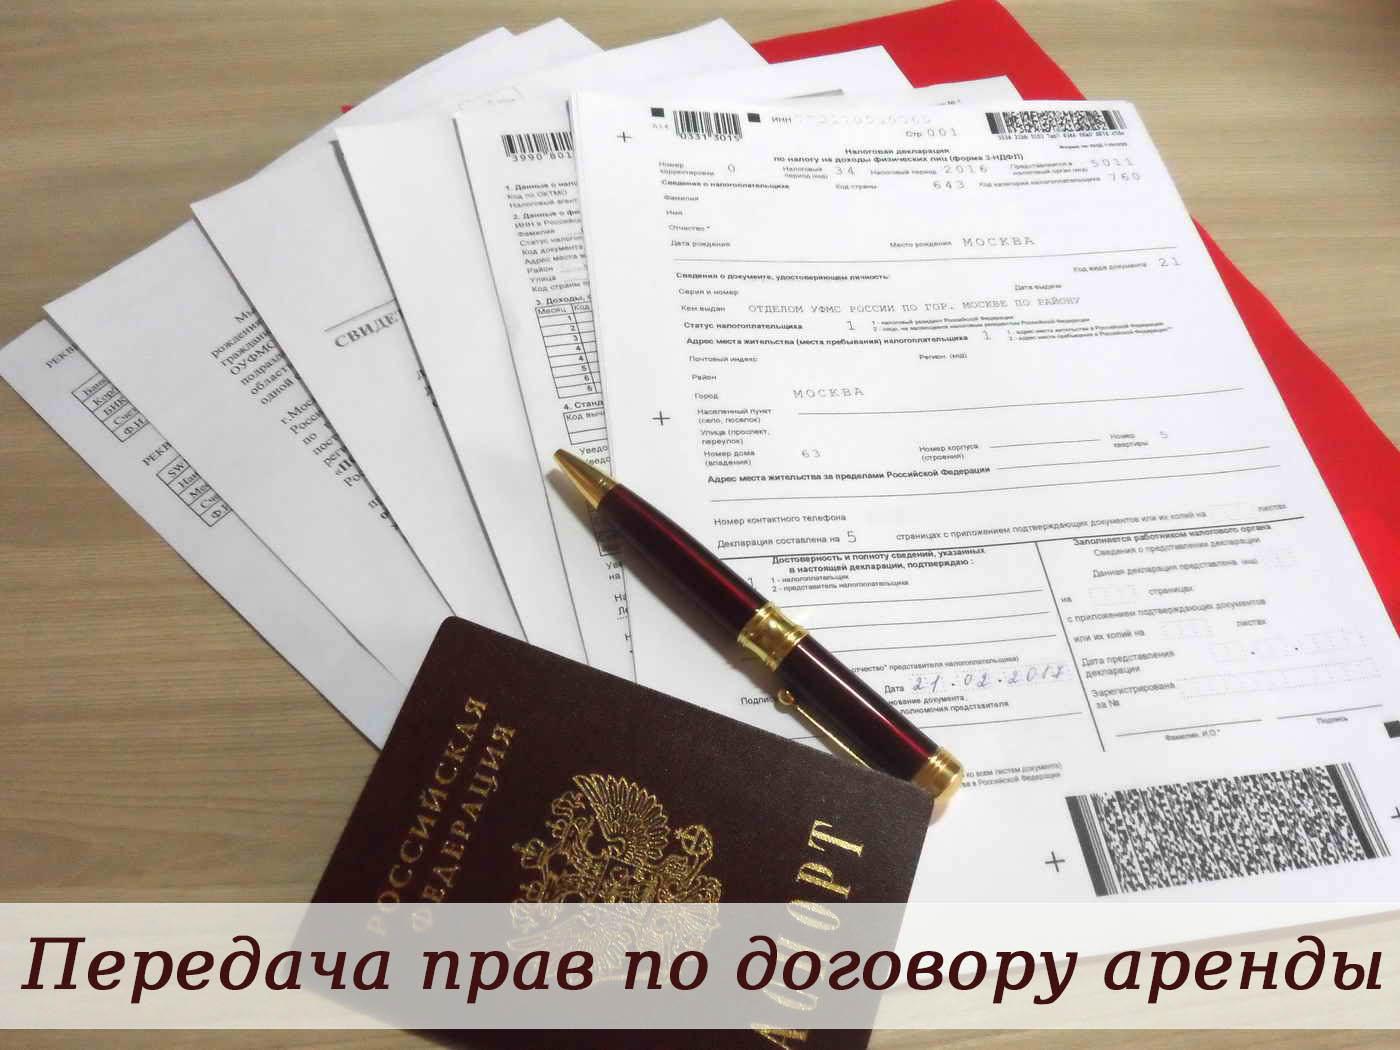 Передача прав по договору аренды